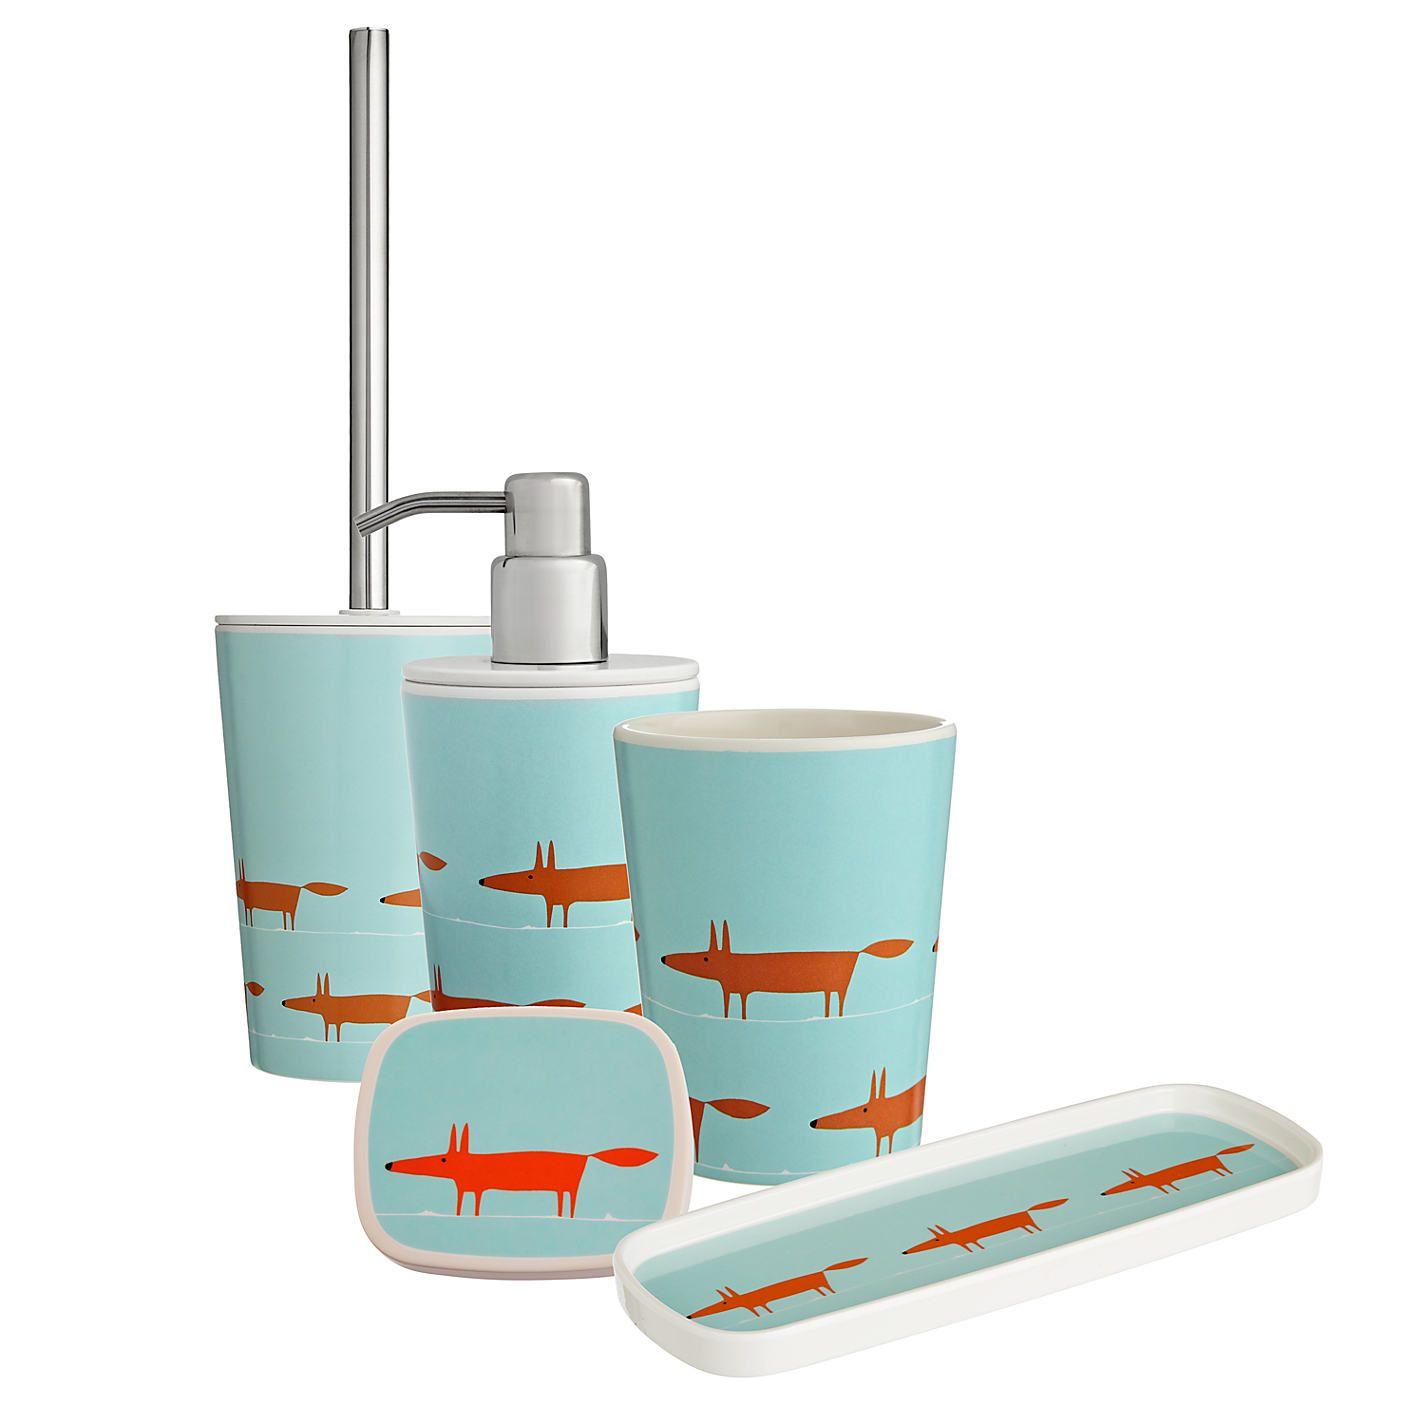 Scion Mr Fox Bathroom Accessoires Bathrooms Pinterest Mr